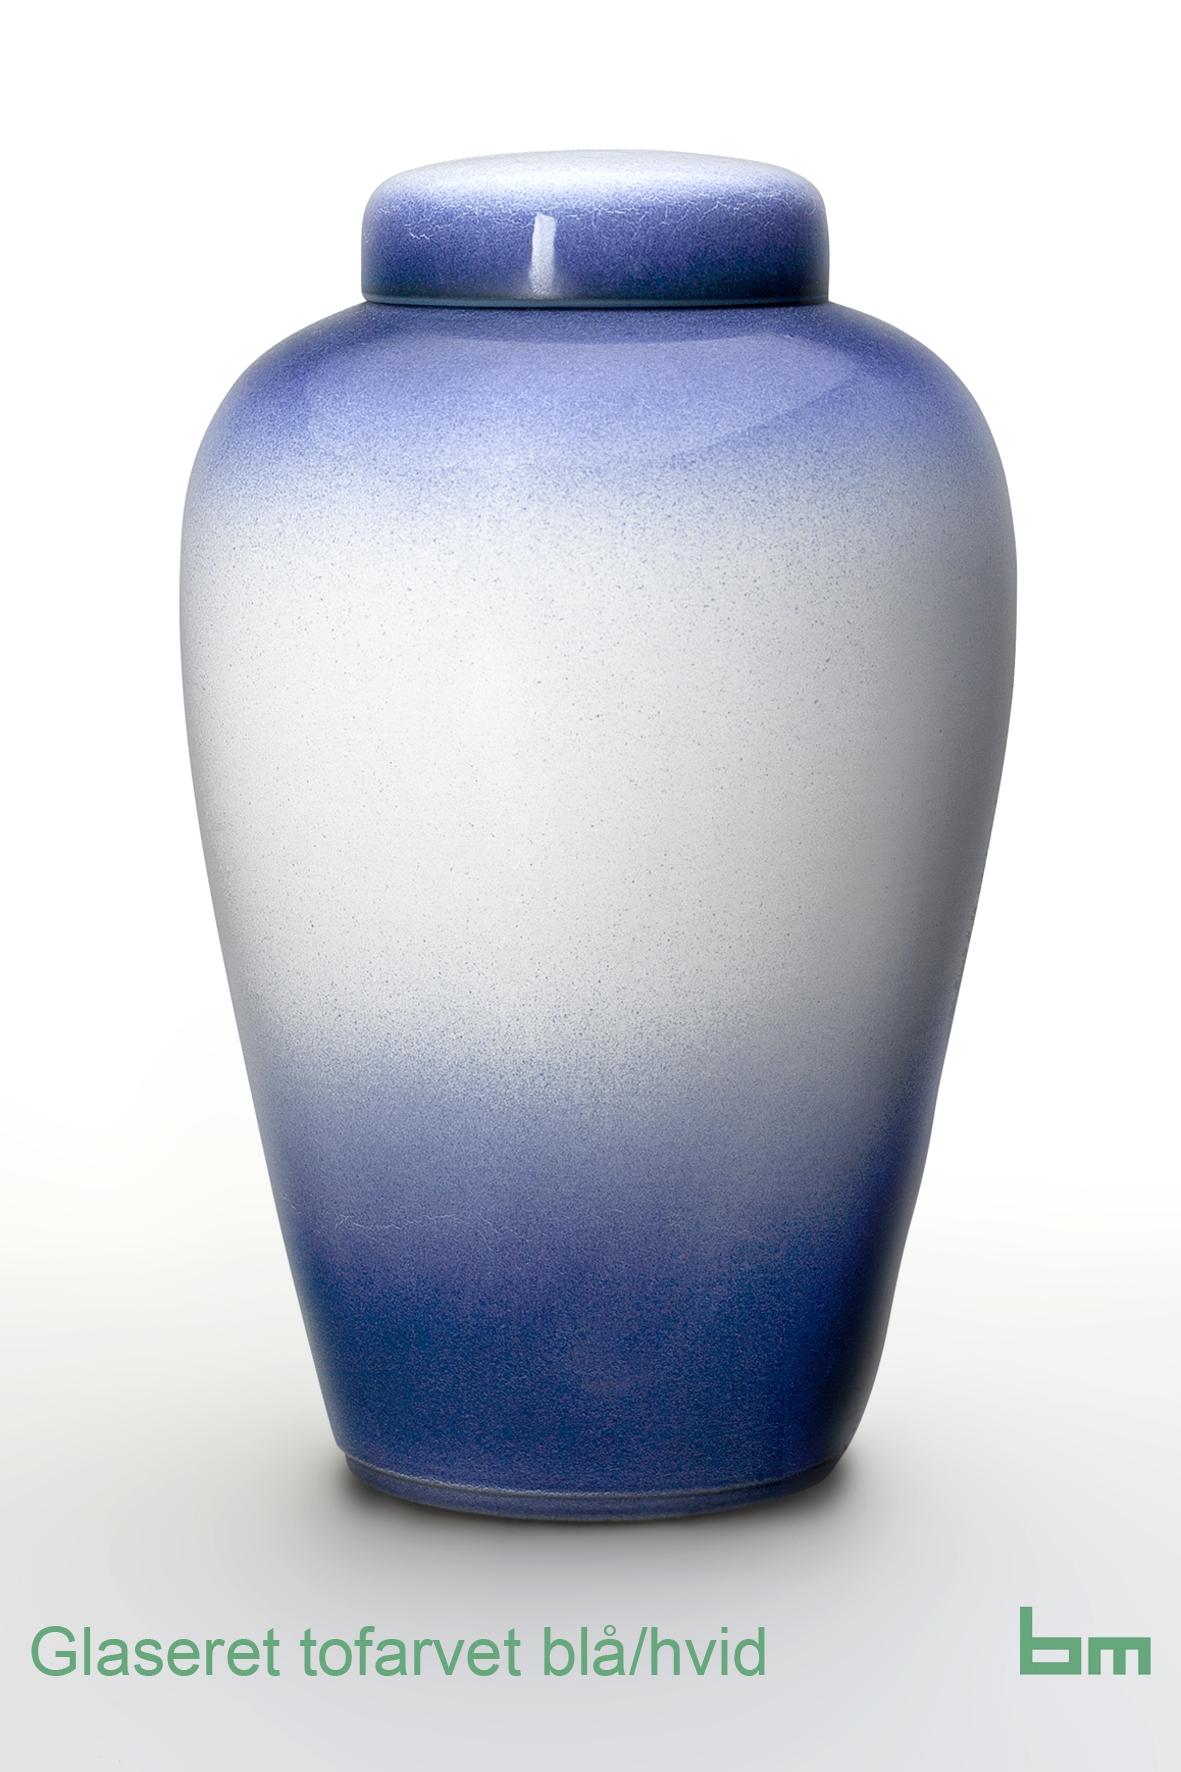 Glaseret tofarvet blåhvid